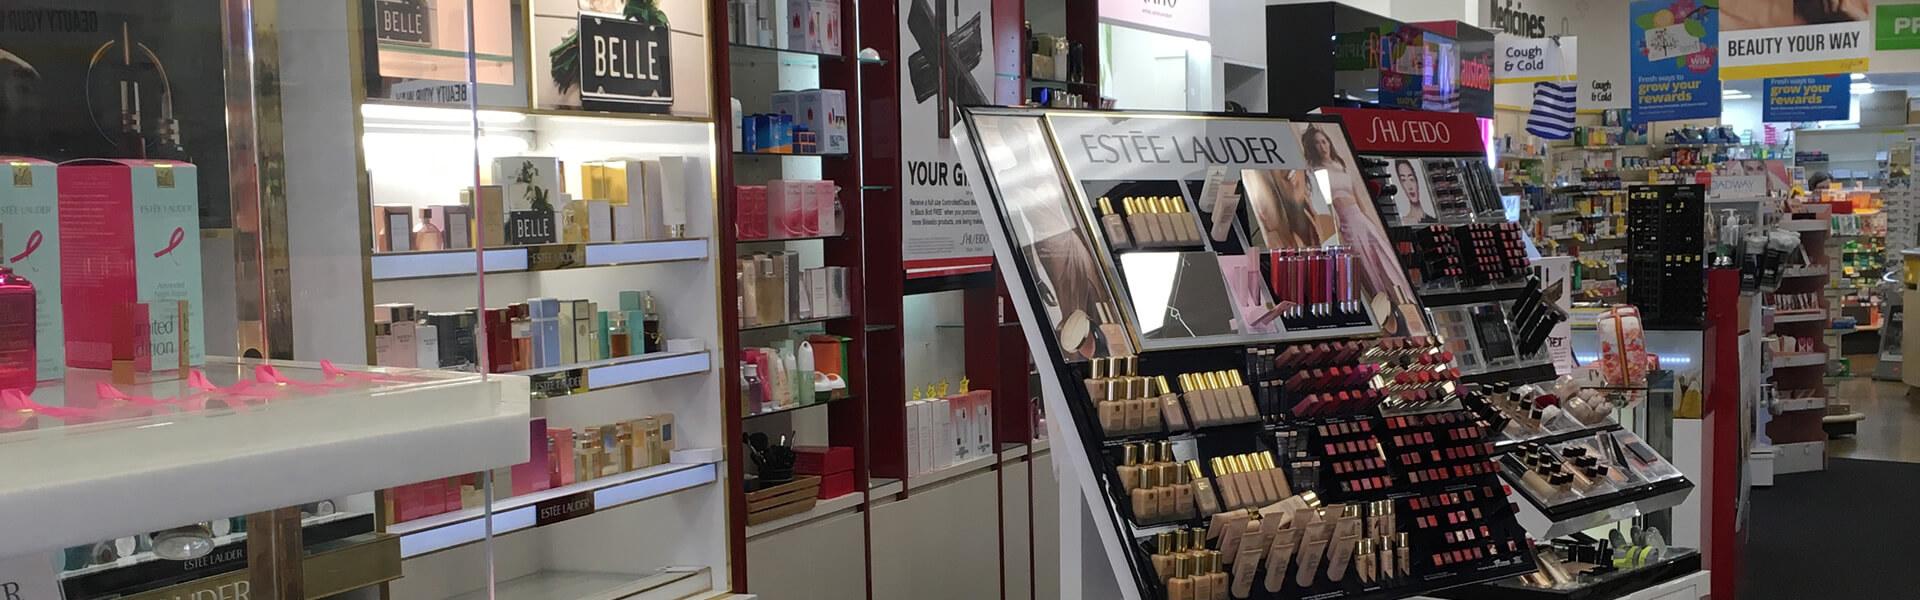 Store Interior 06 At Life Pharmacy Blenheim In Marlborough NZ